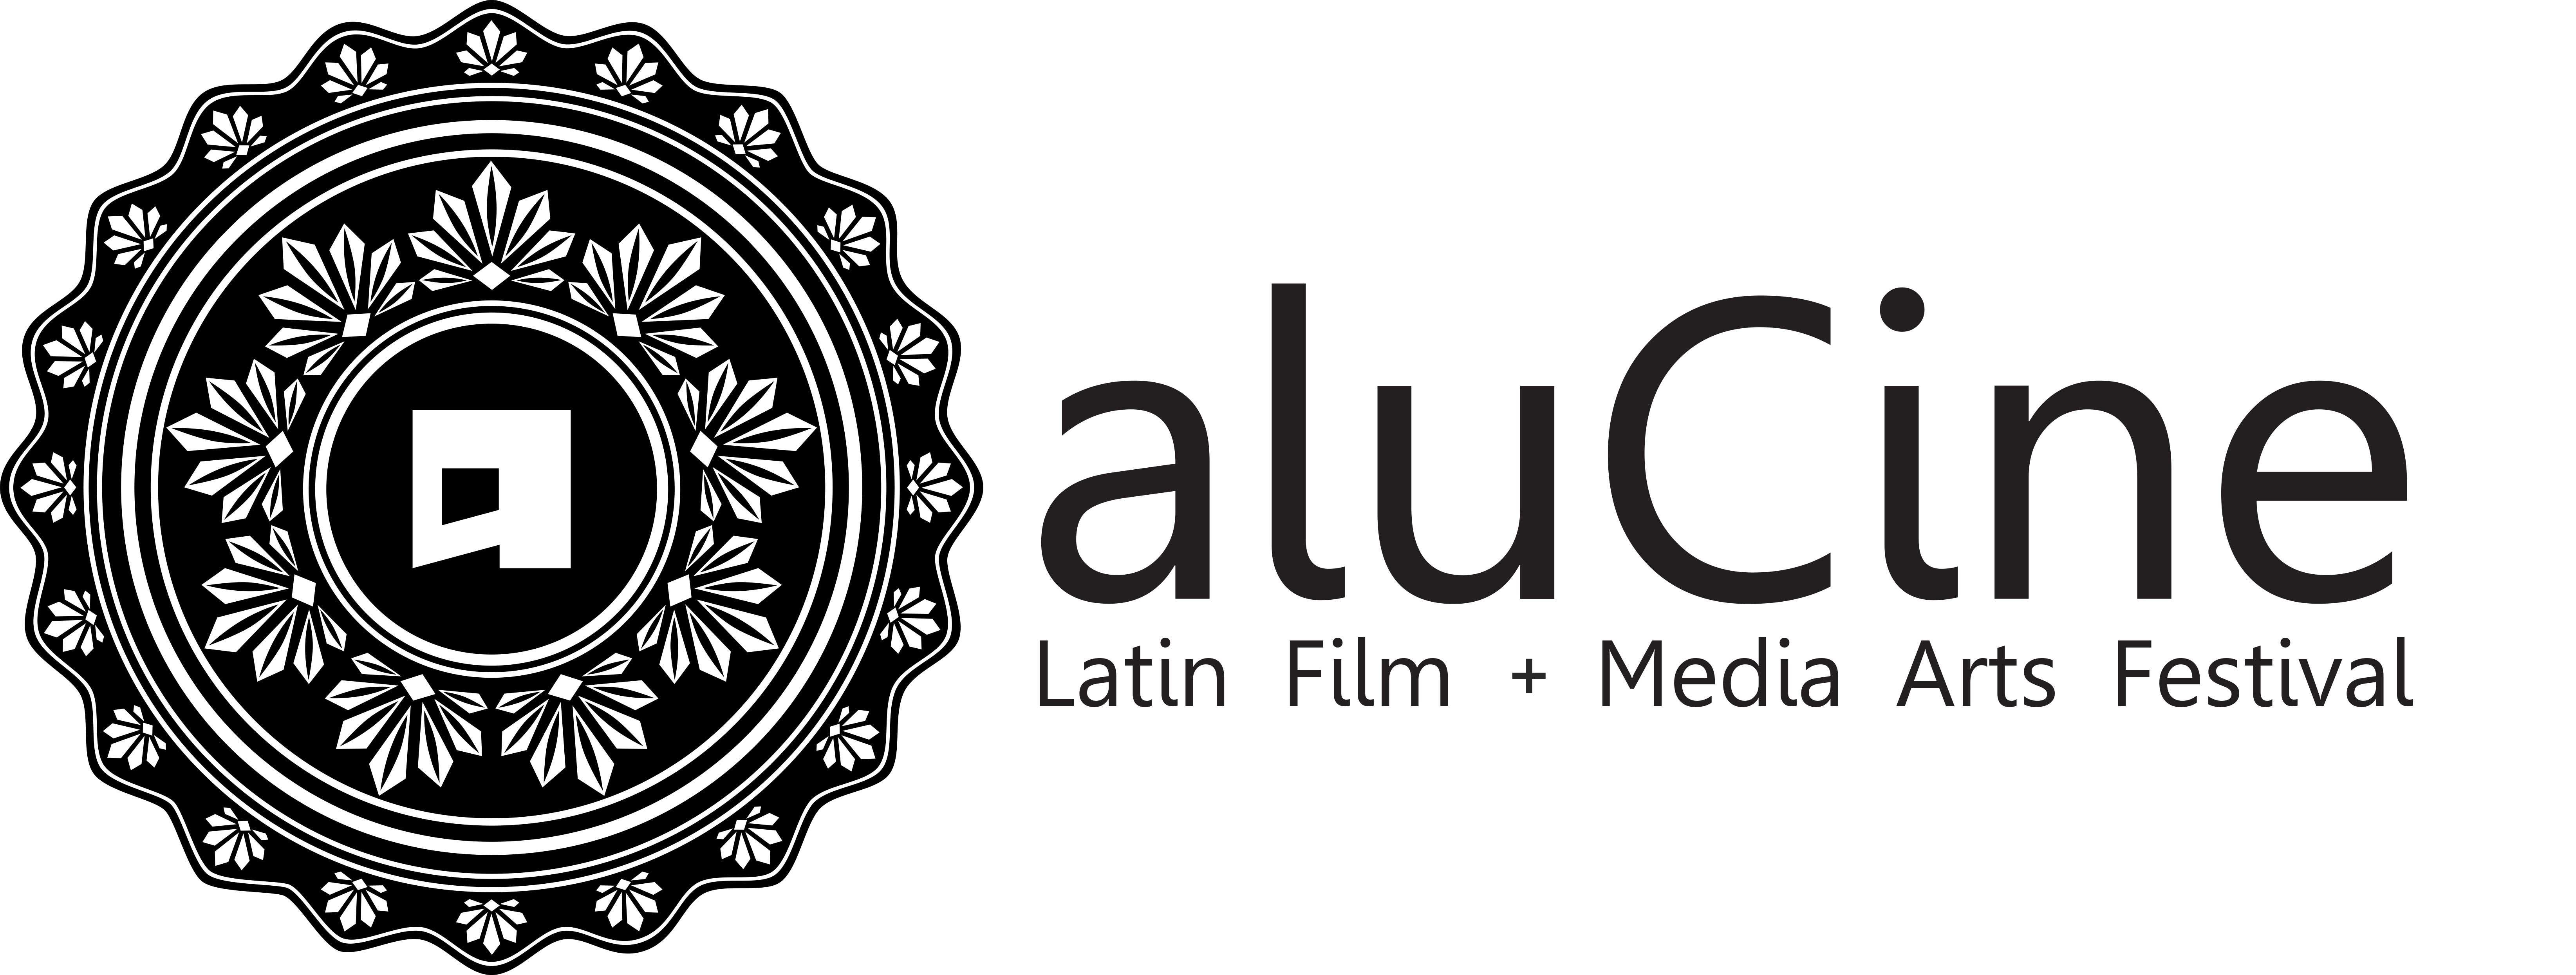 aluCine Latin Film + Media Arts Festival